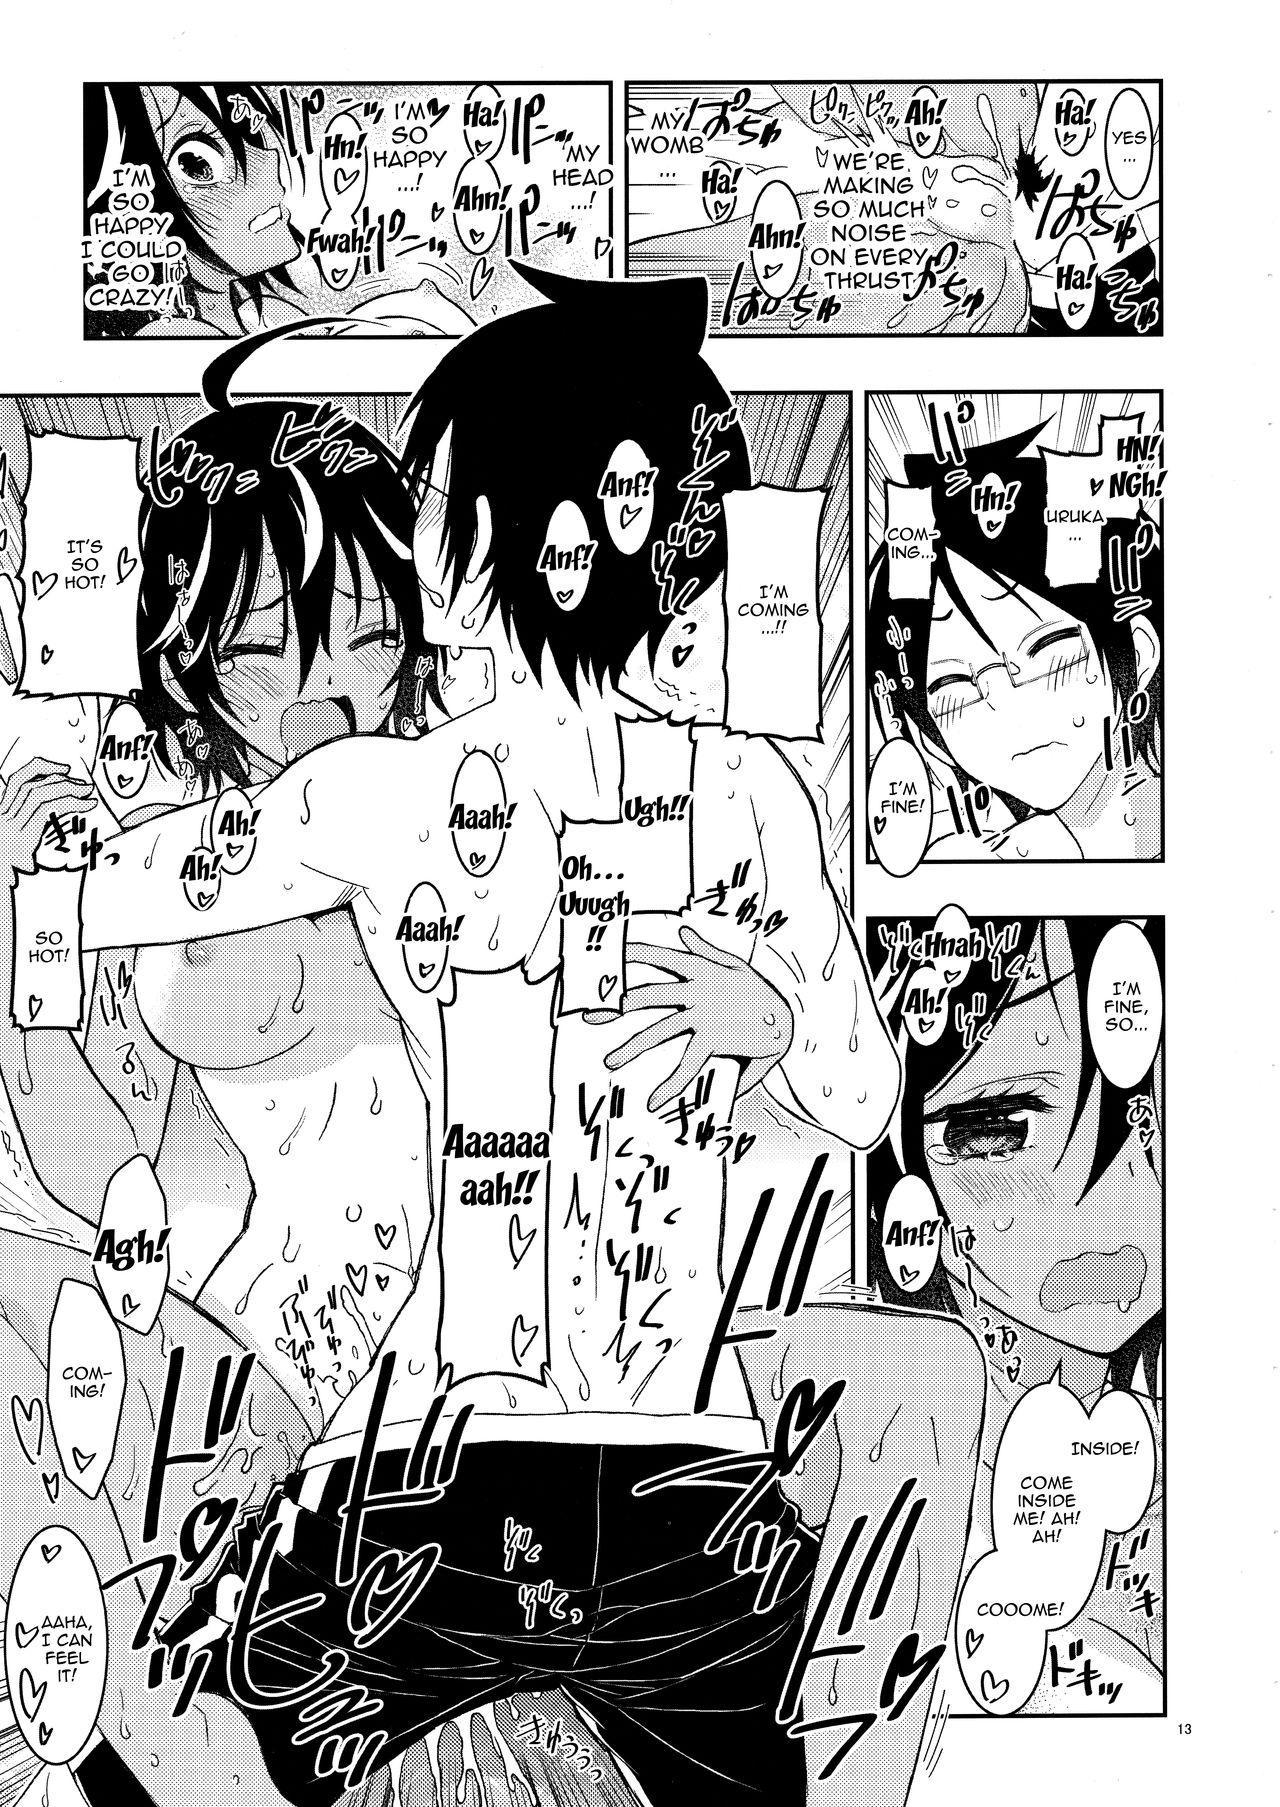 BOKUTACHIHA SENSEIMO URUKAMO KAWAII 2 | Our Sensei And Uruka Are Both So Cute 2 11